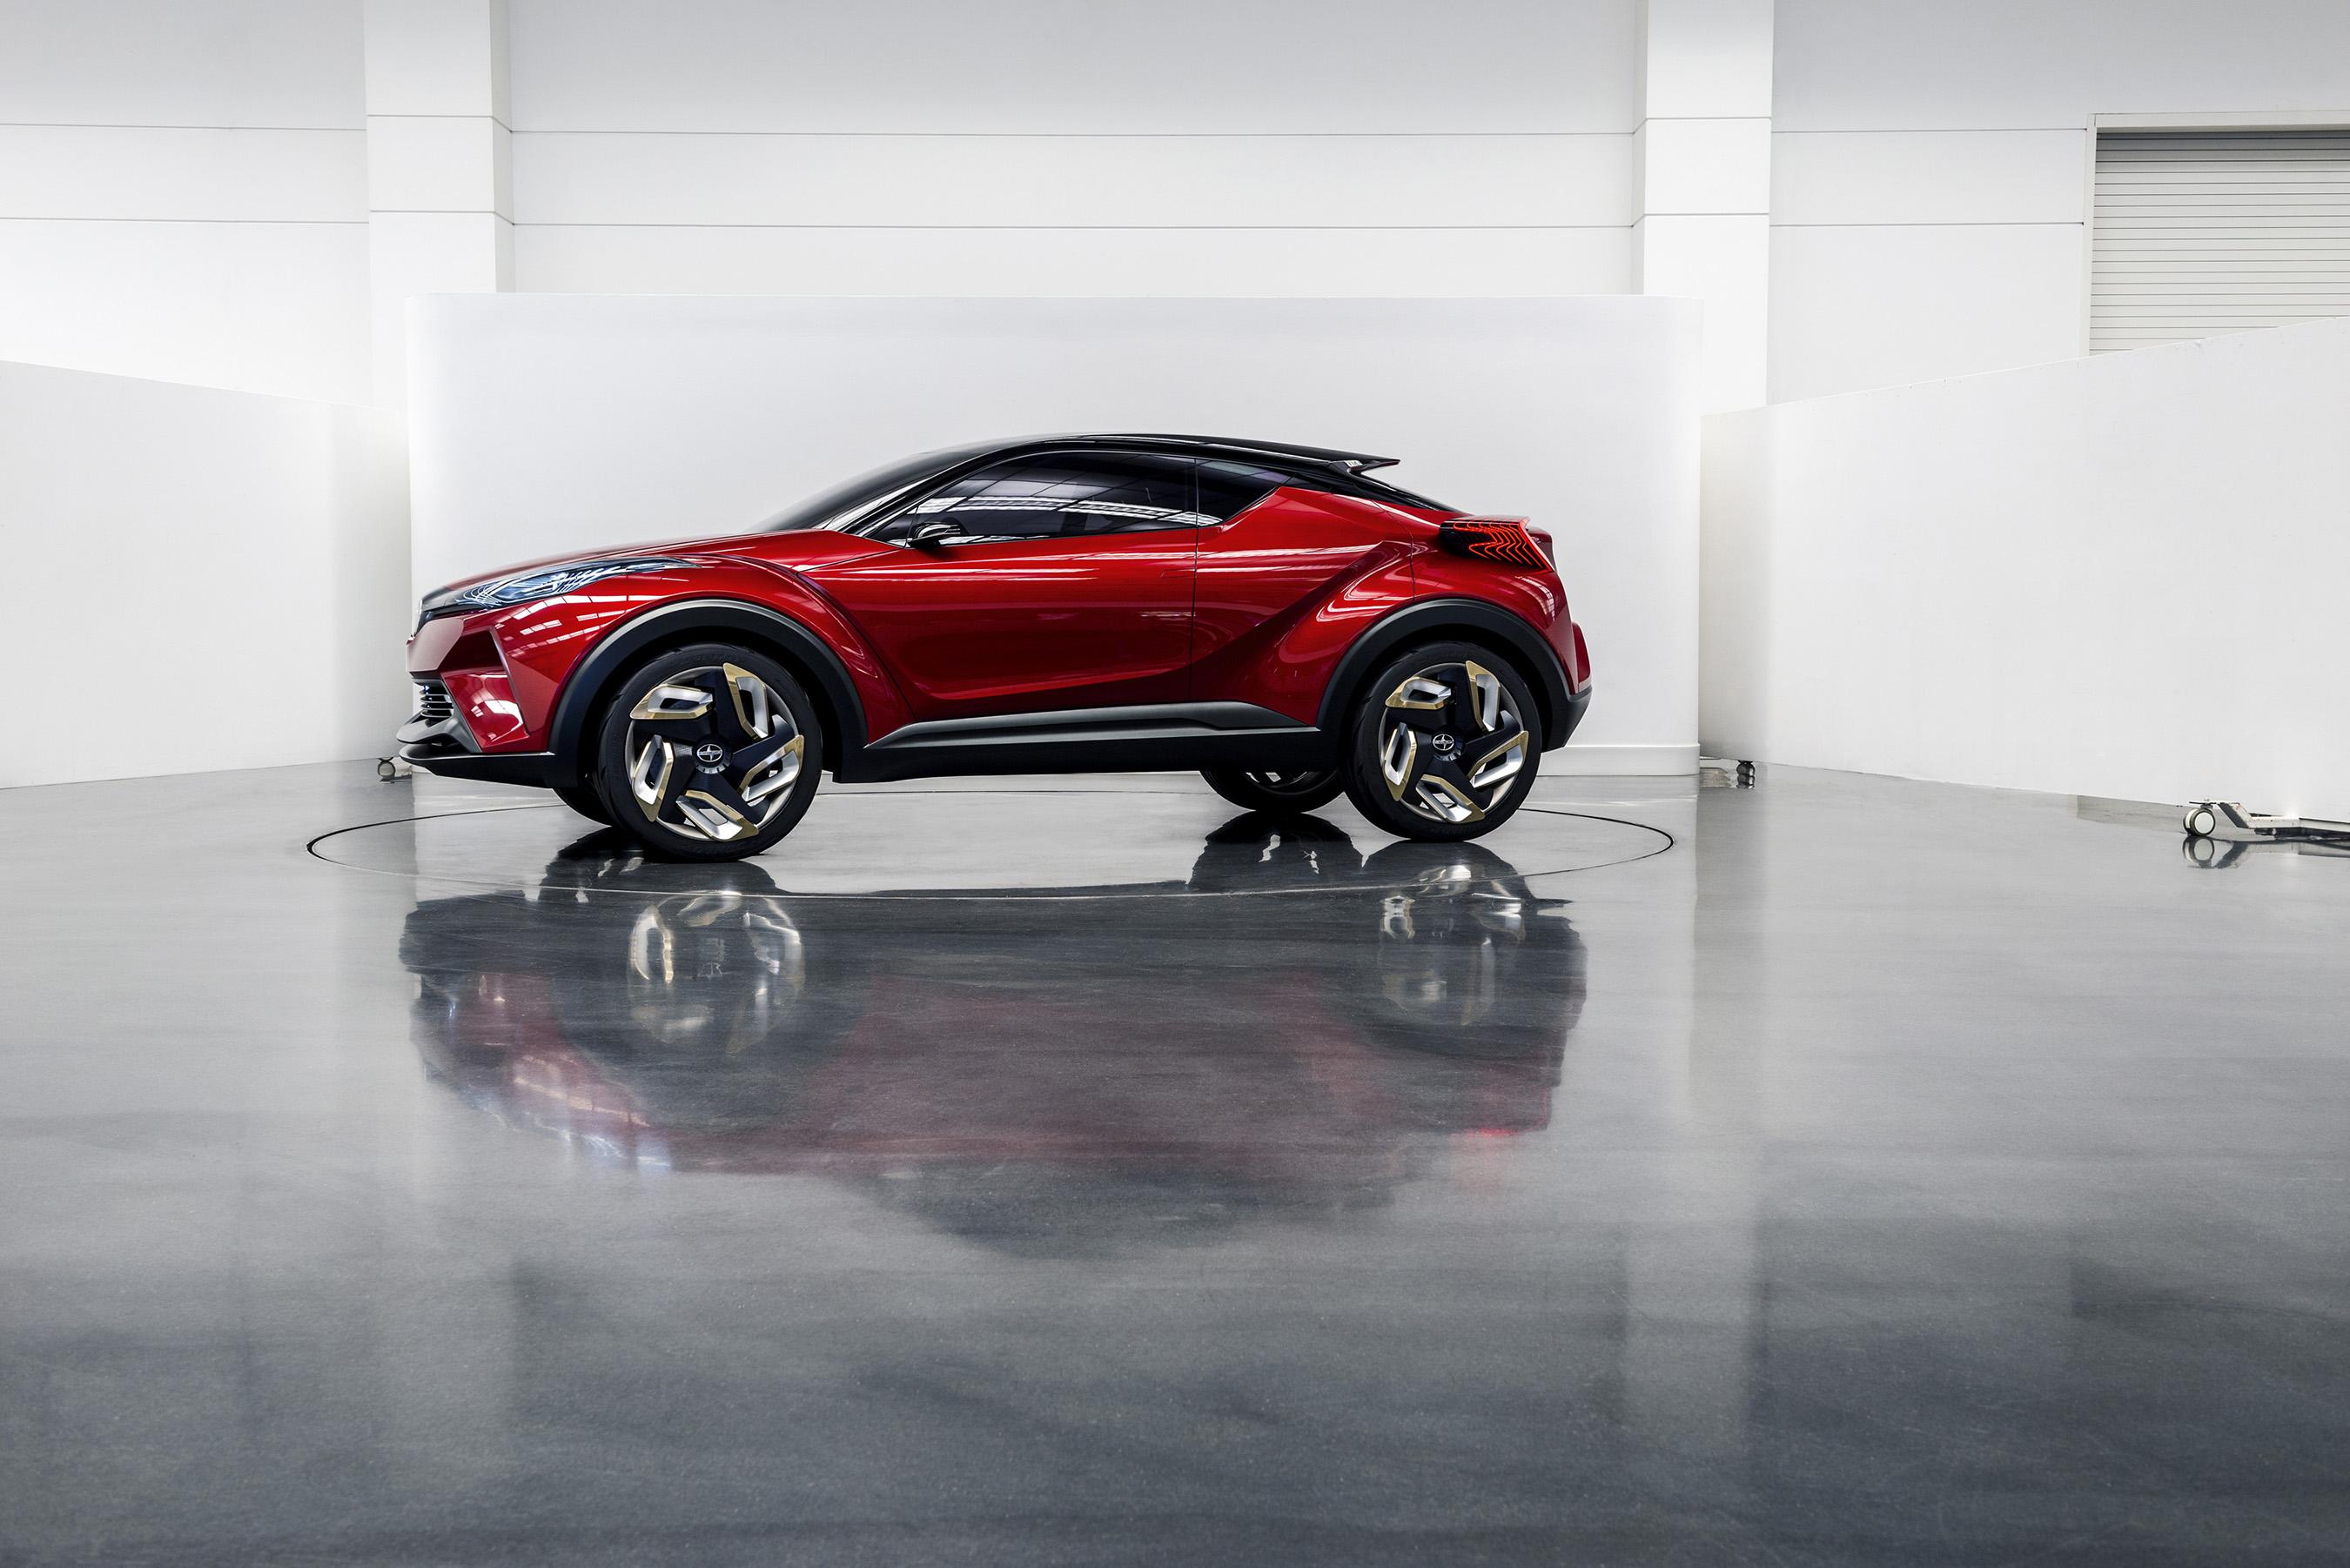 Scion C-HR Concept Urban Lifestyle Vehicle